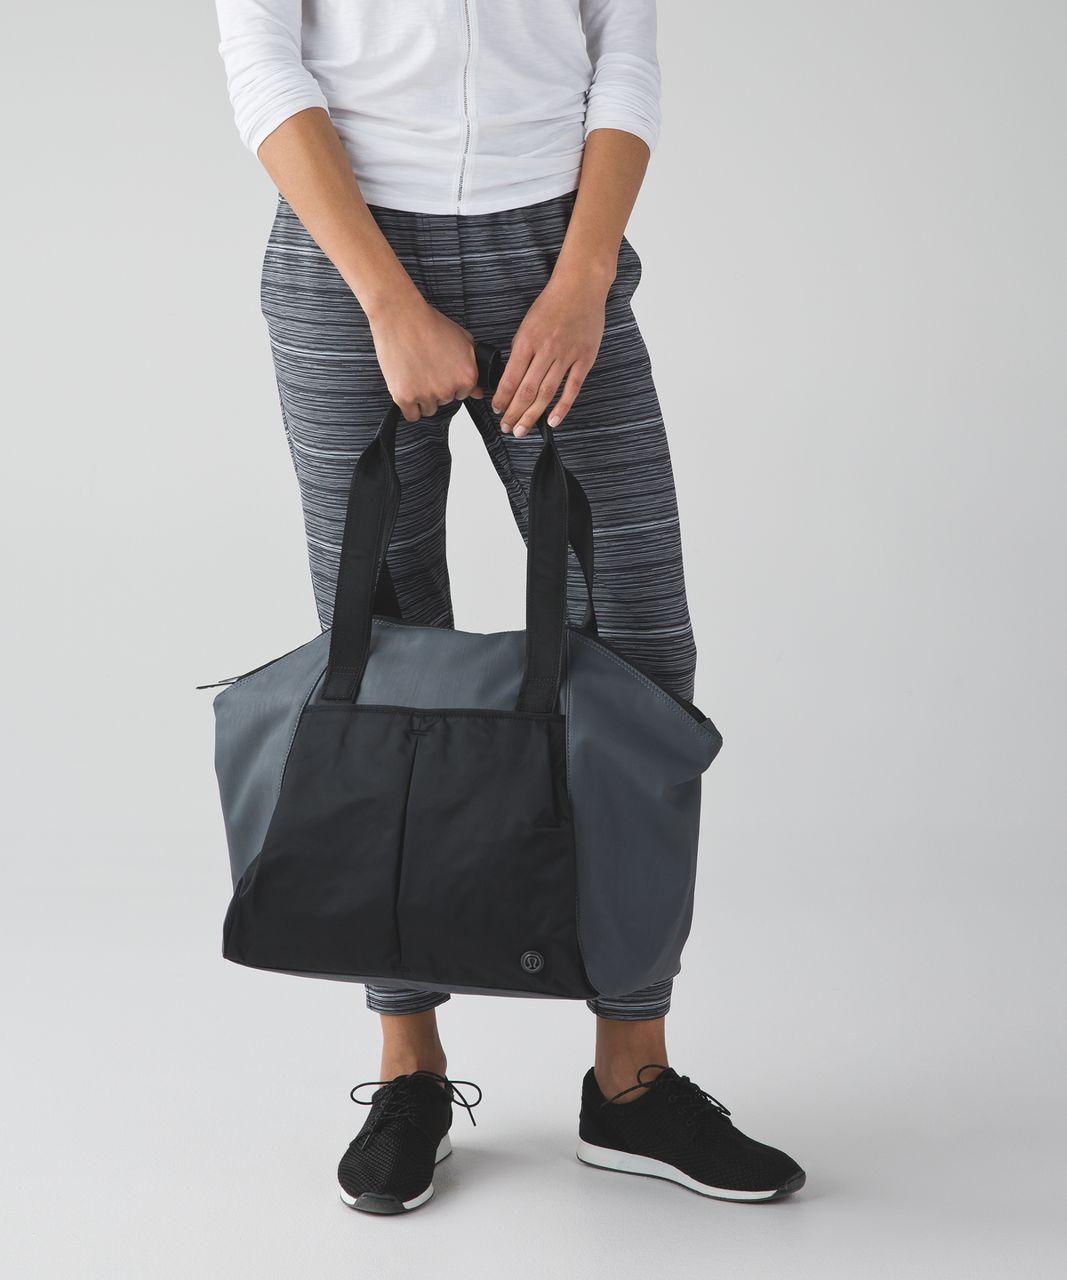 Lululemon Free To Be Bag - Black / Dark Slate